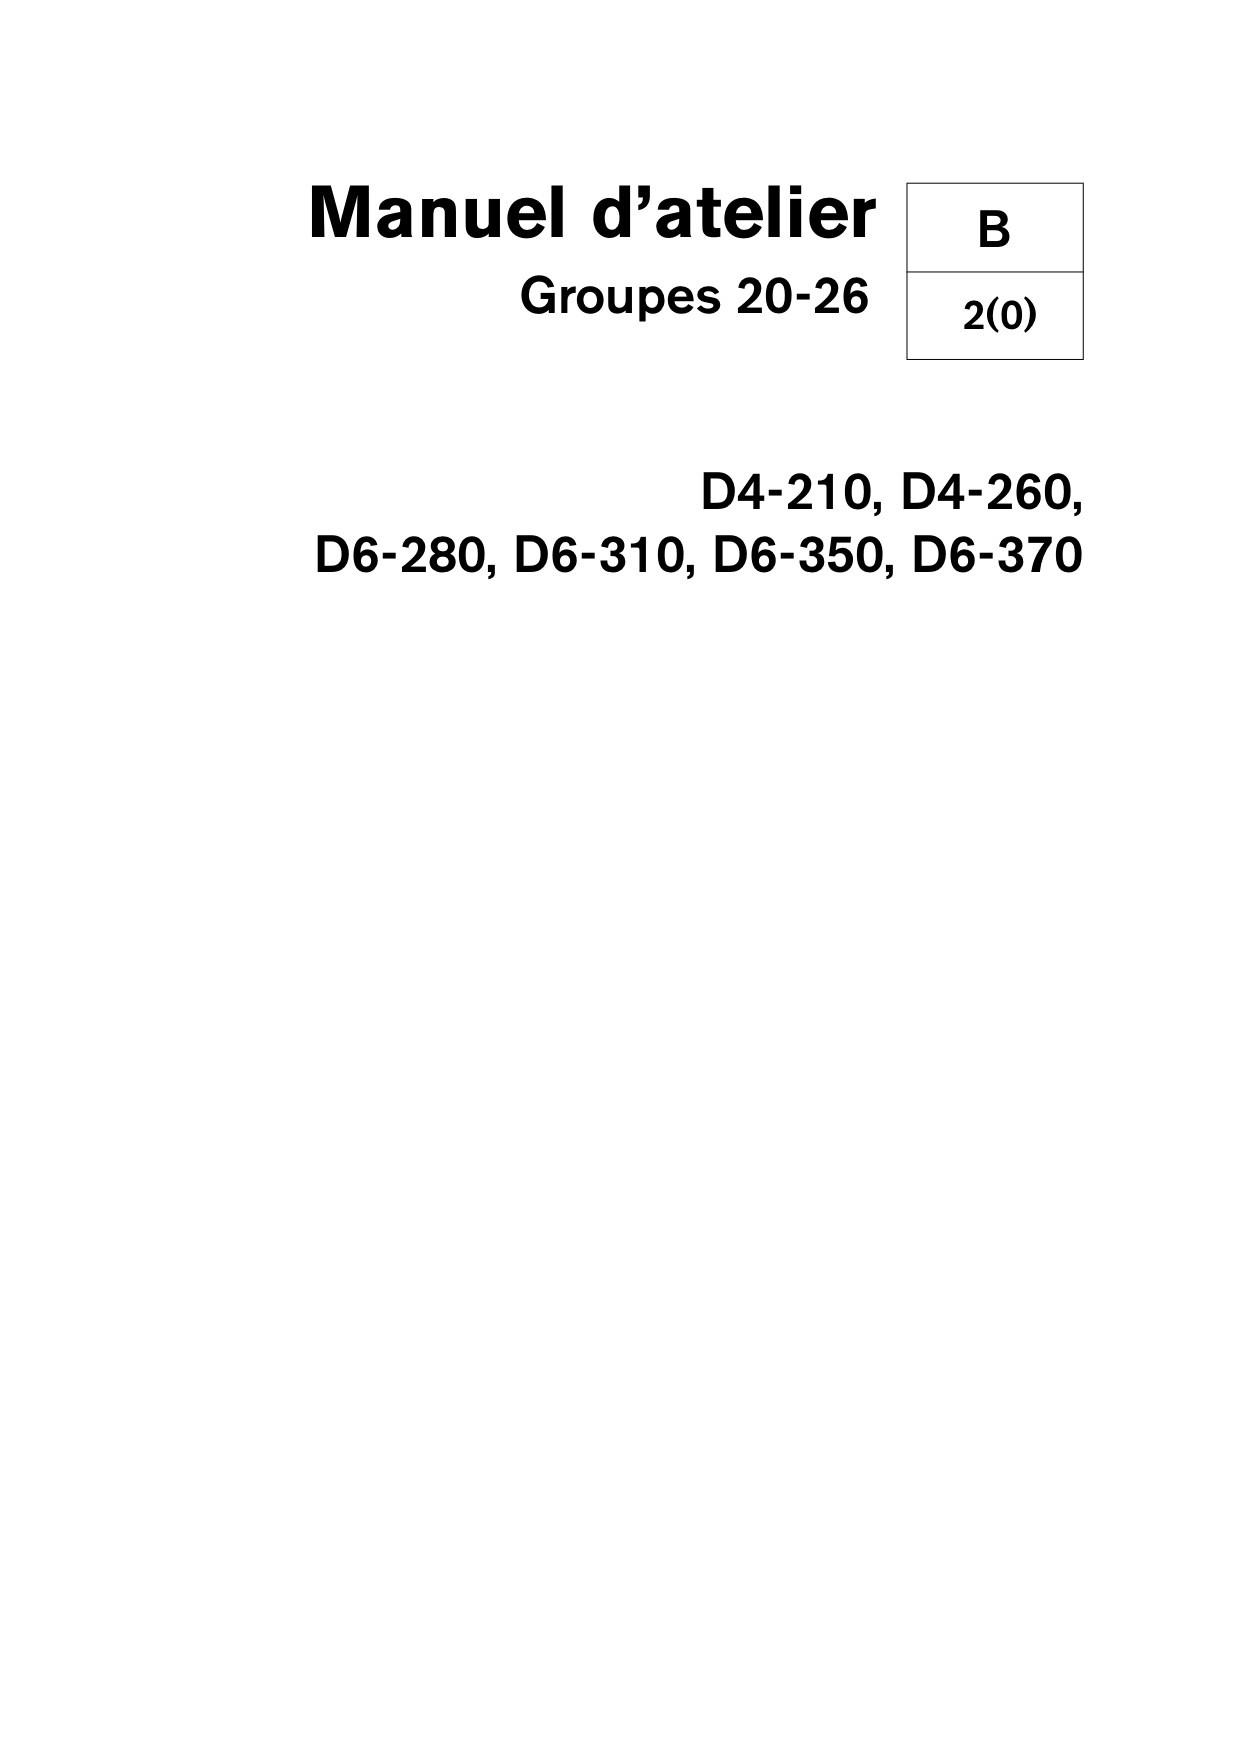 hight resolution of volvo penta diesel d4 210 d4 260 d6 280 d6 310 d6 350 d6 370 groupe 20 26 02 2006